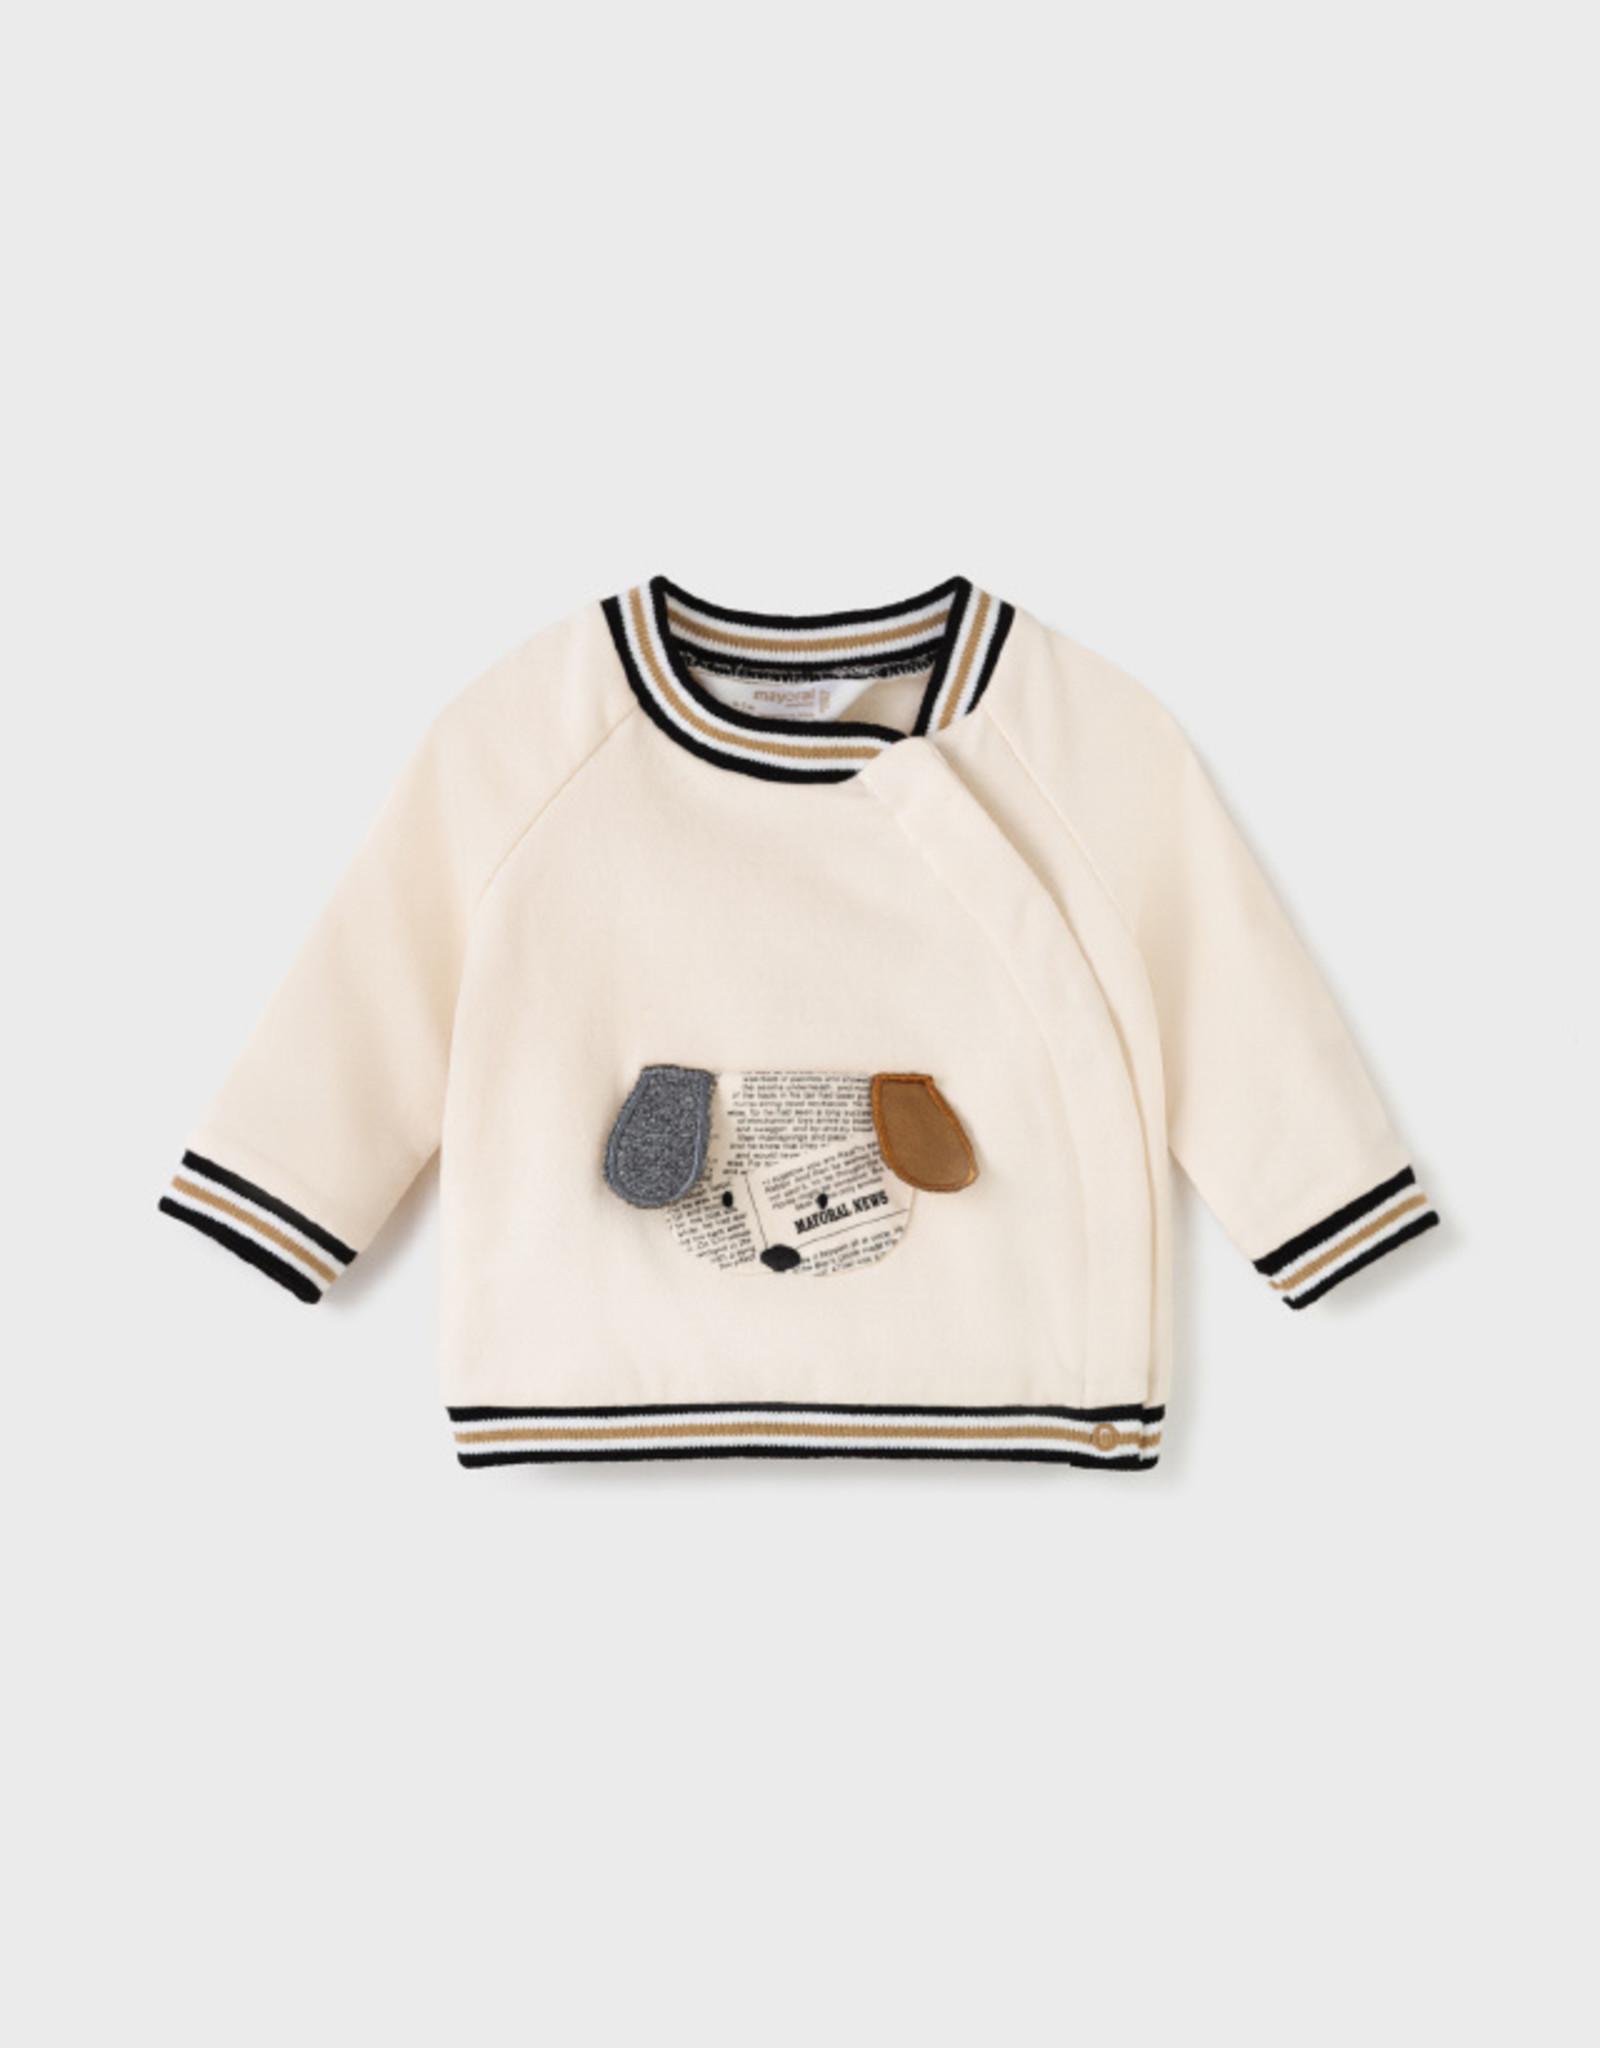 Mayoral FA21 Beige Puppy Sweater